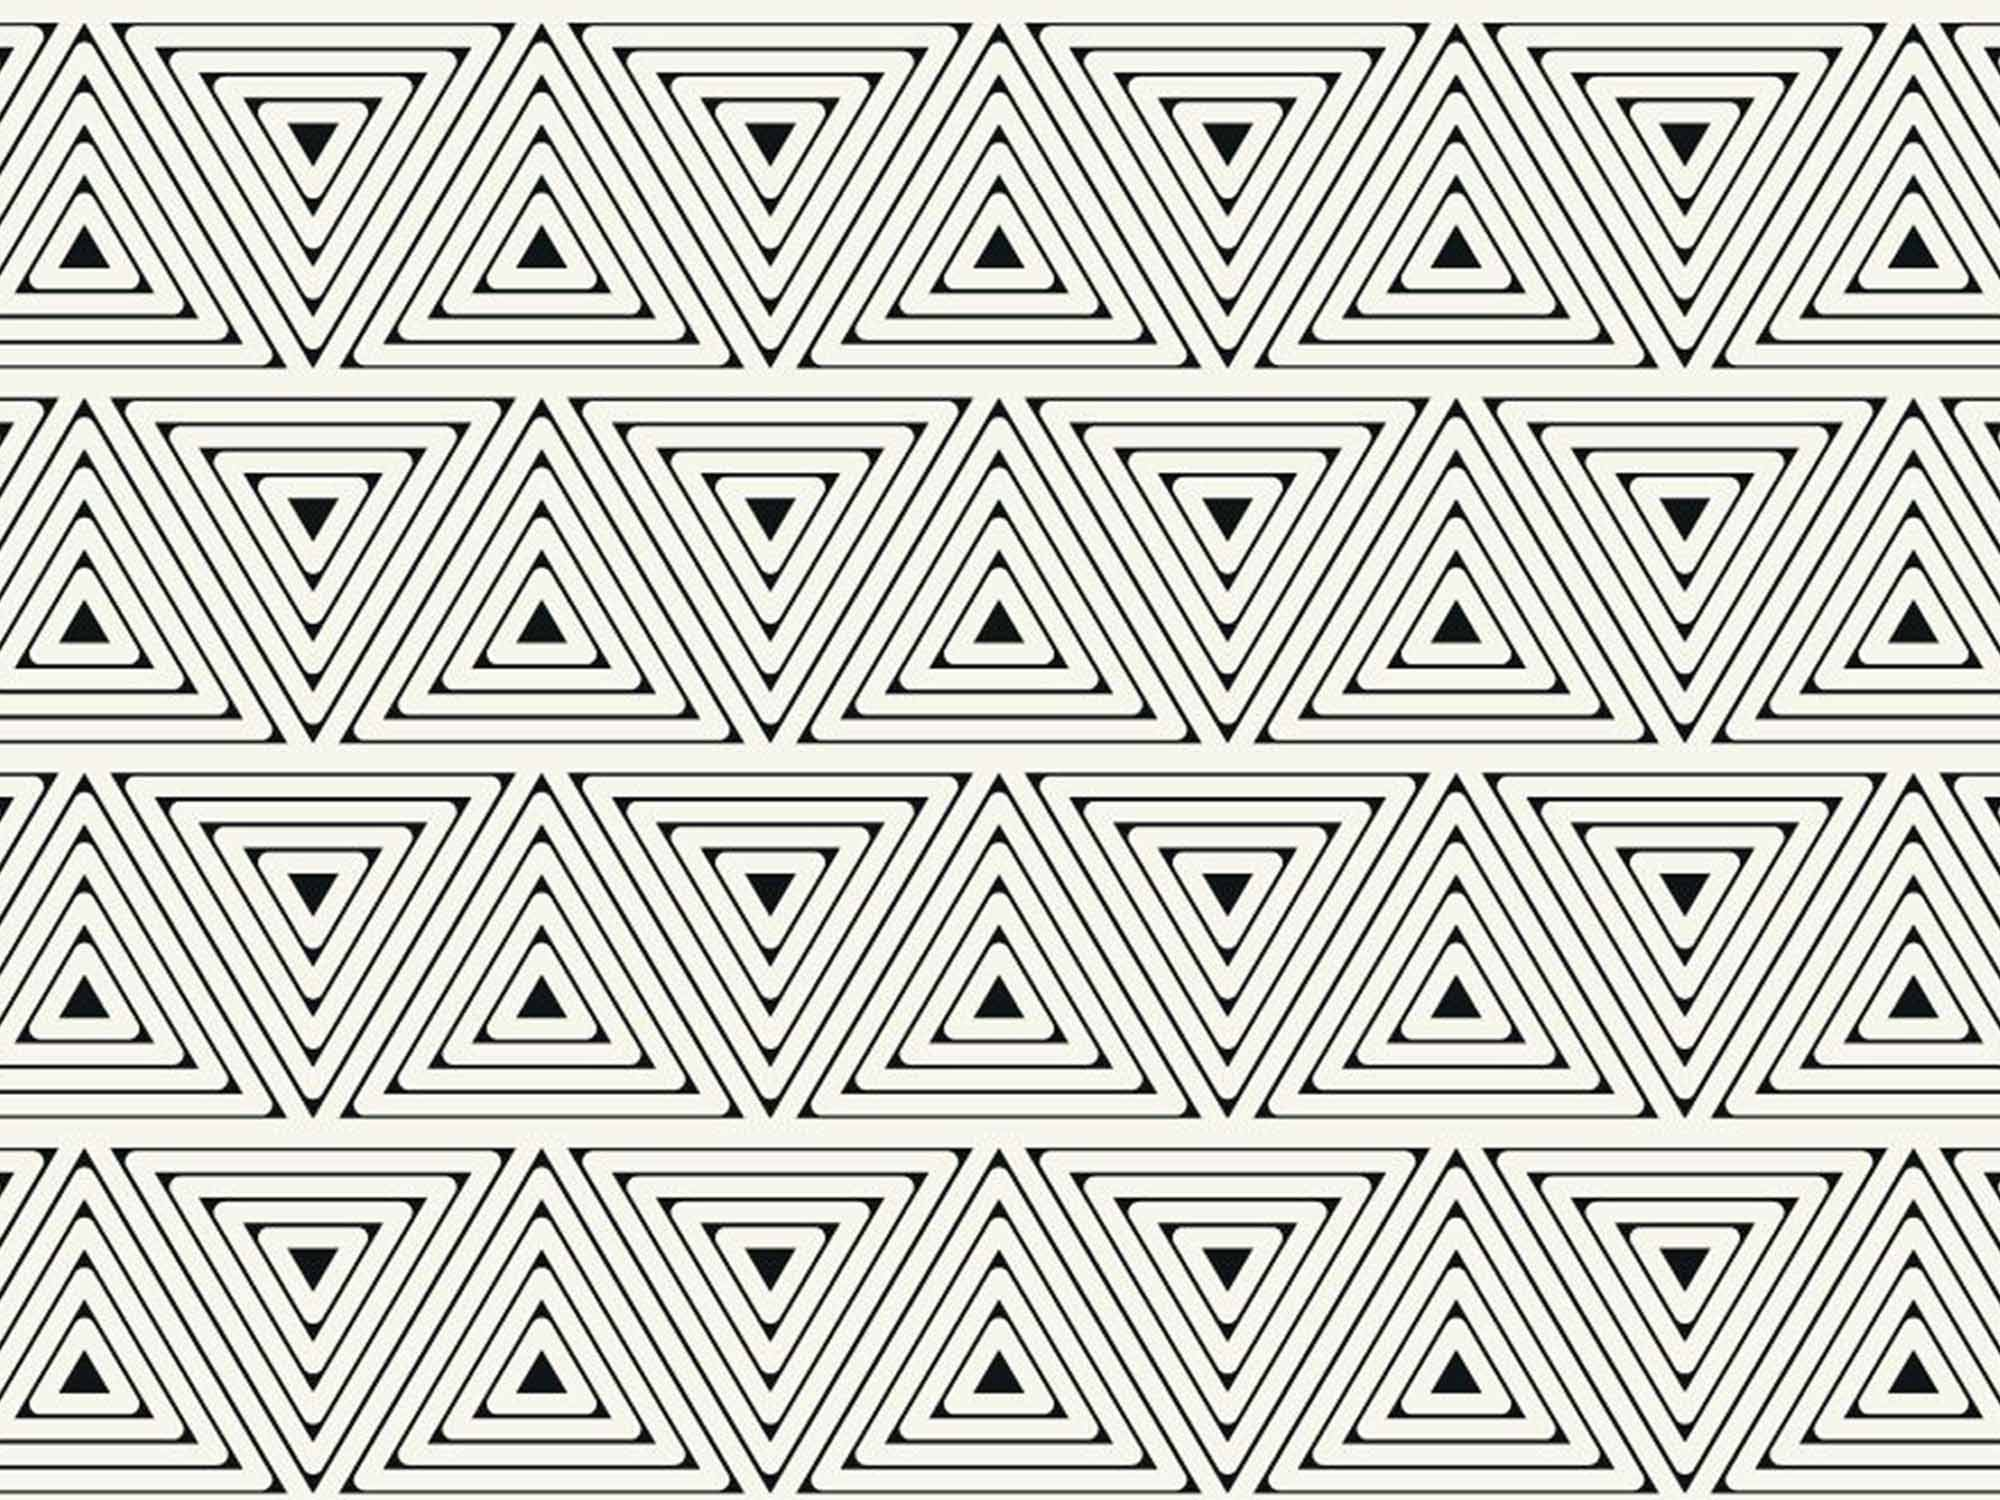 Papel de Parede para Sala Geométrico 0059 - Adesivos de Parede  - Paredes Decoradas